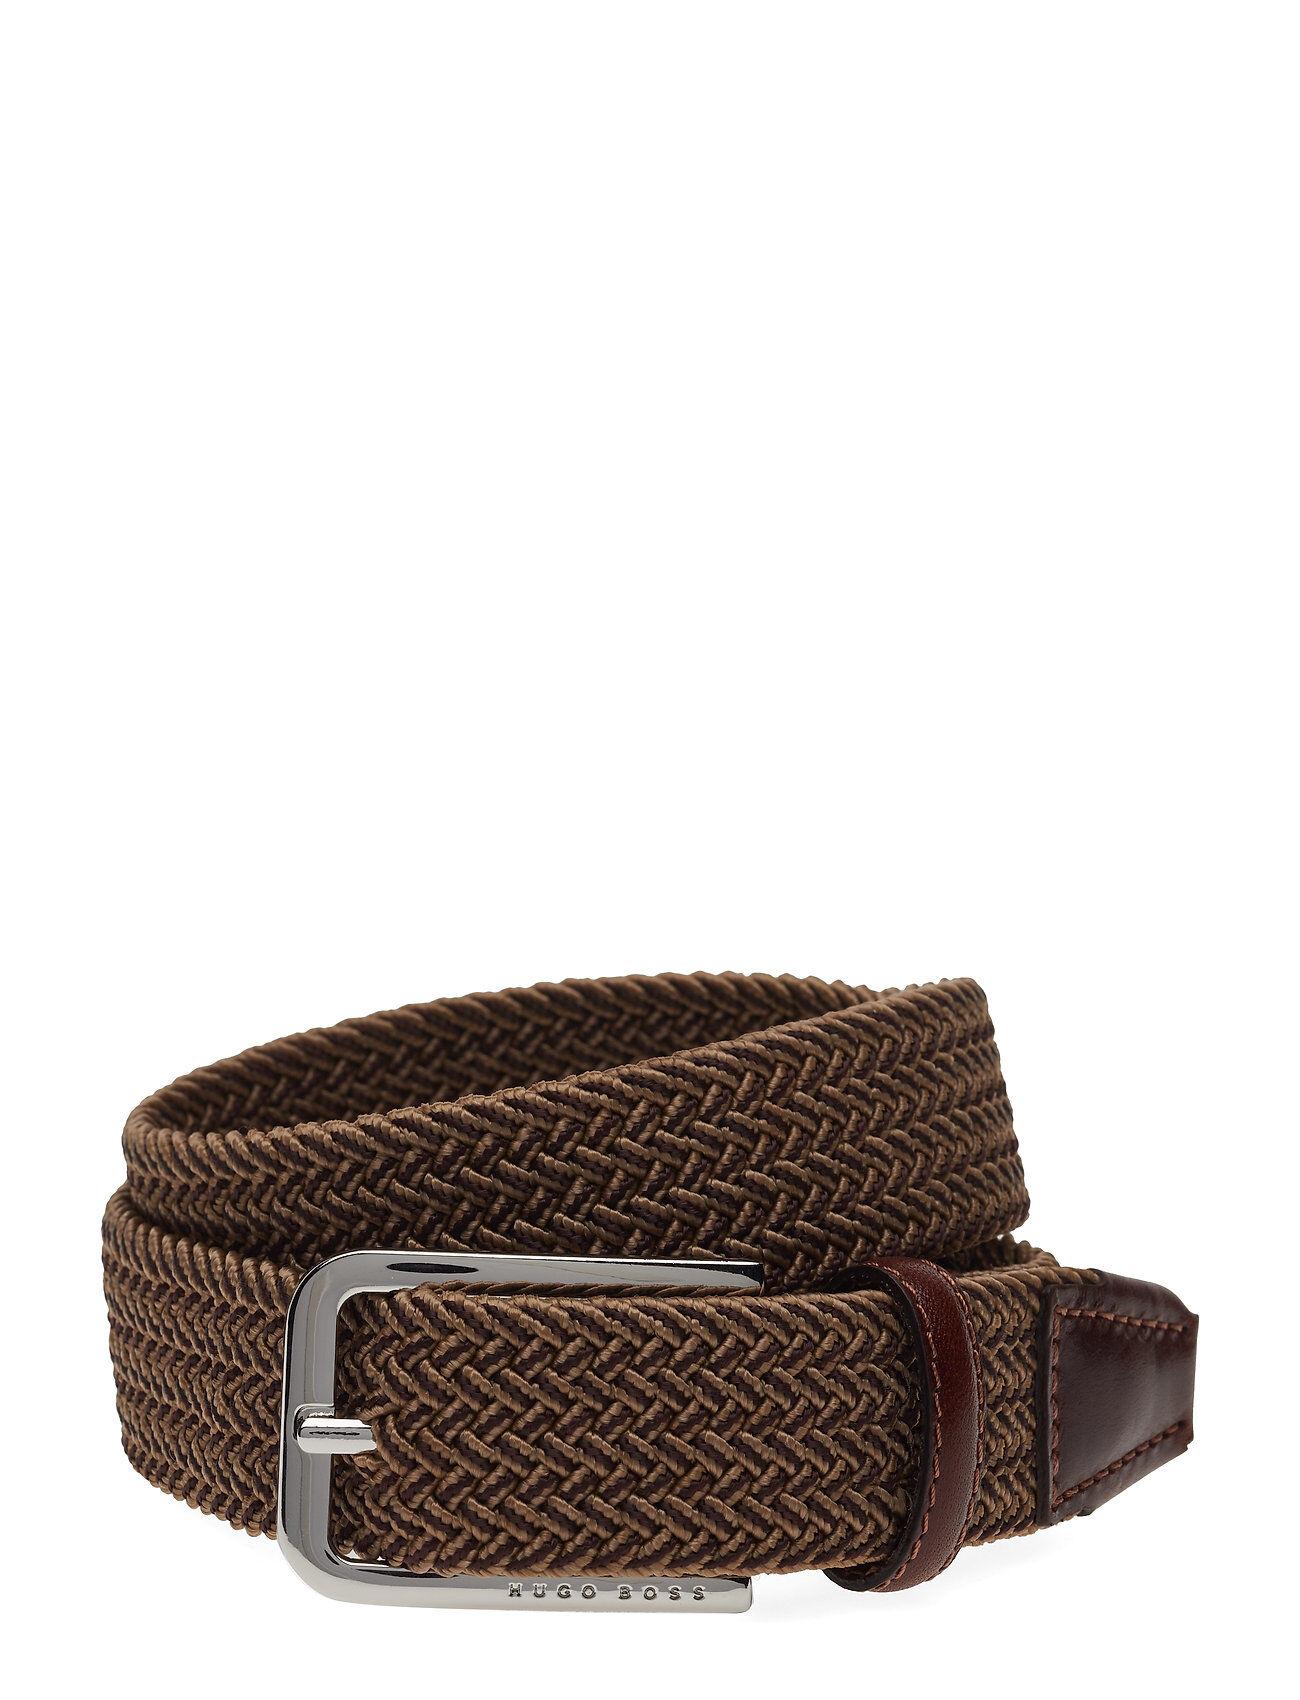 Image of Boss Clorio_sz30 Accessories Belts Braided Belt Ruskea